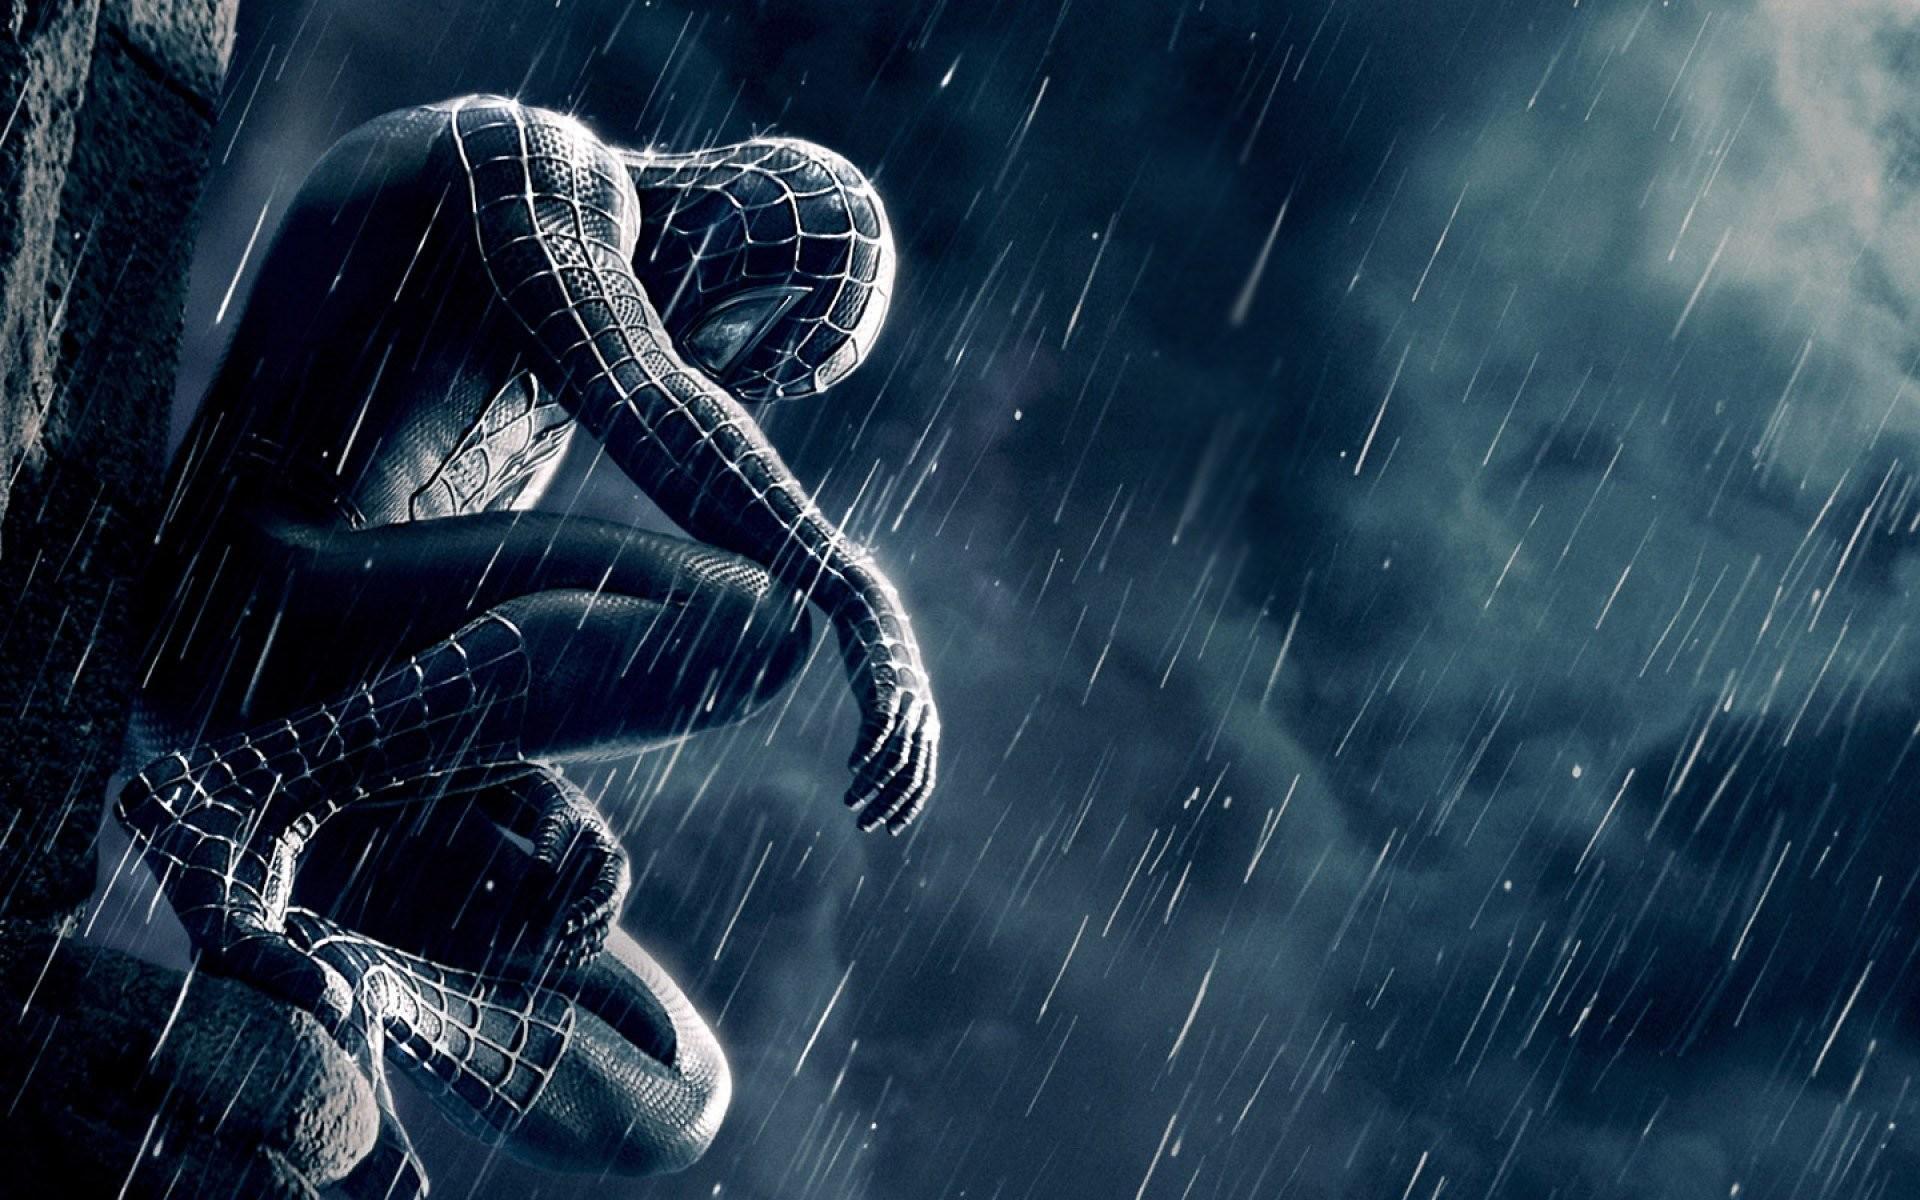 black spiderman wallpaper 183��